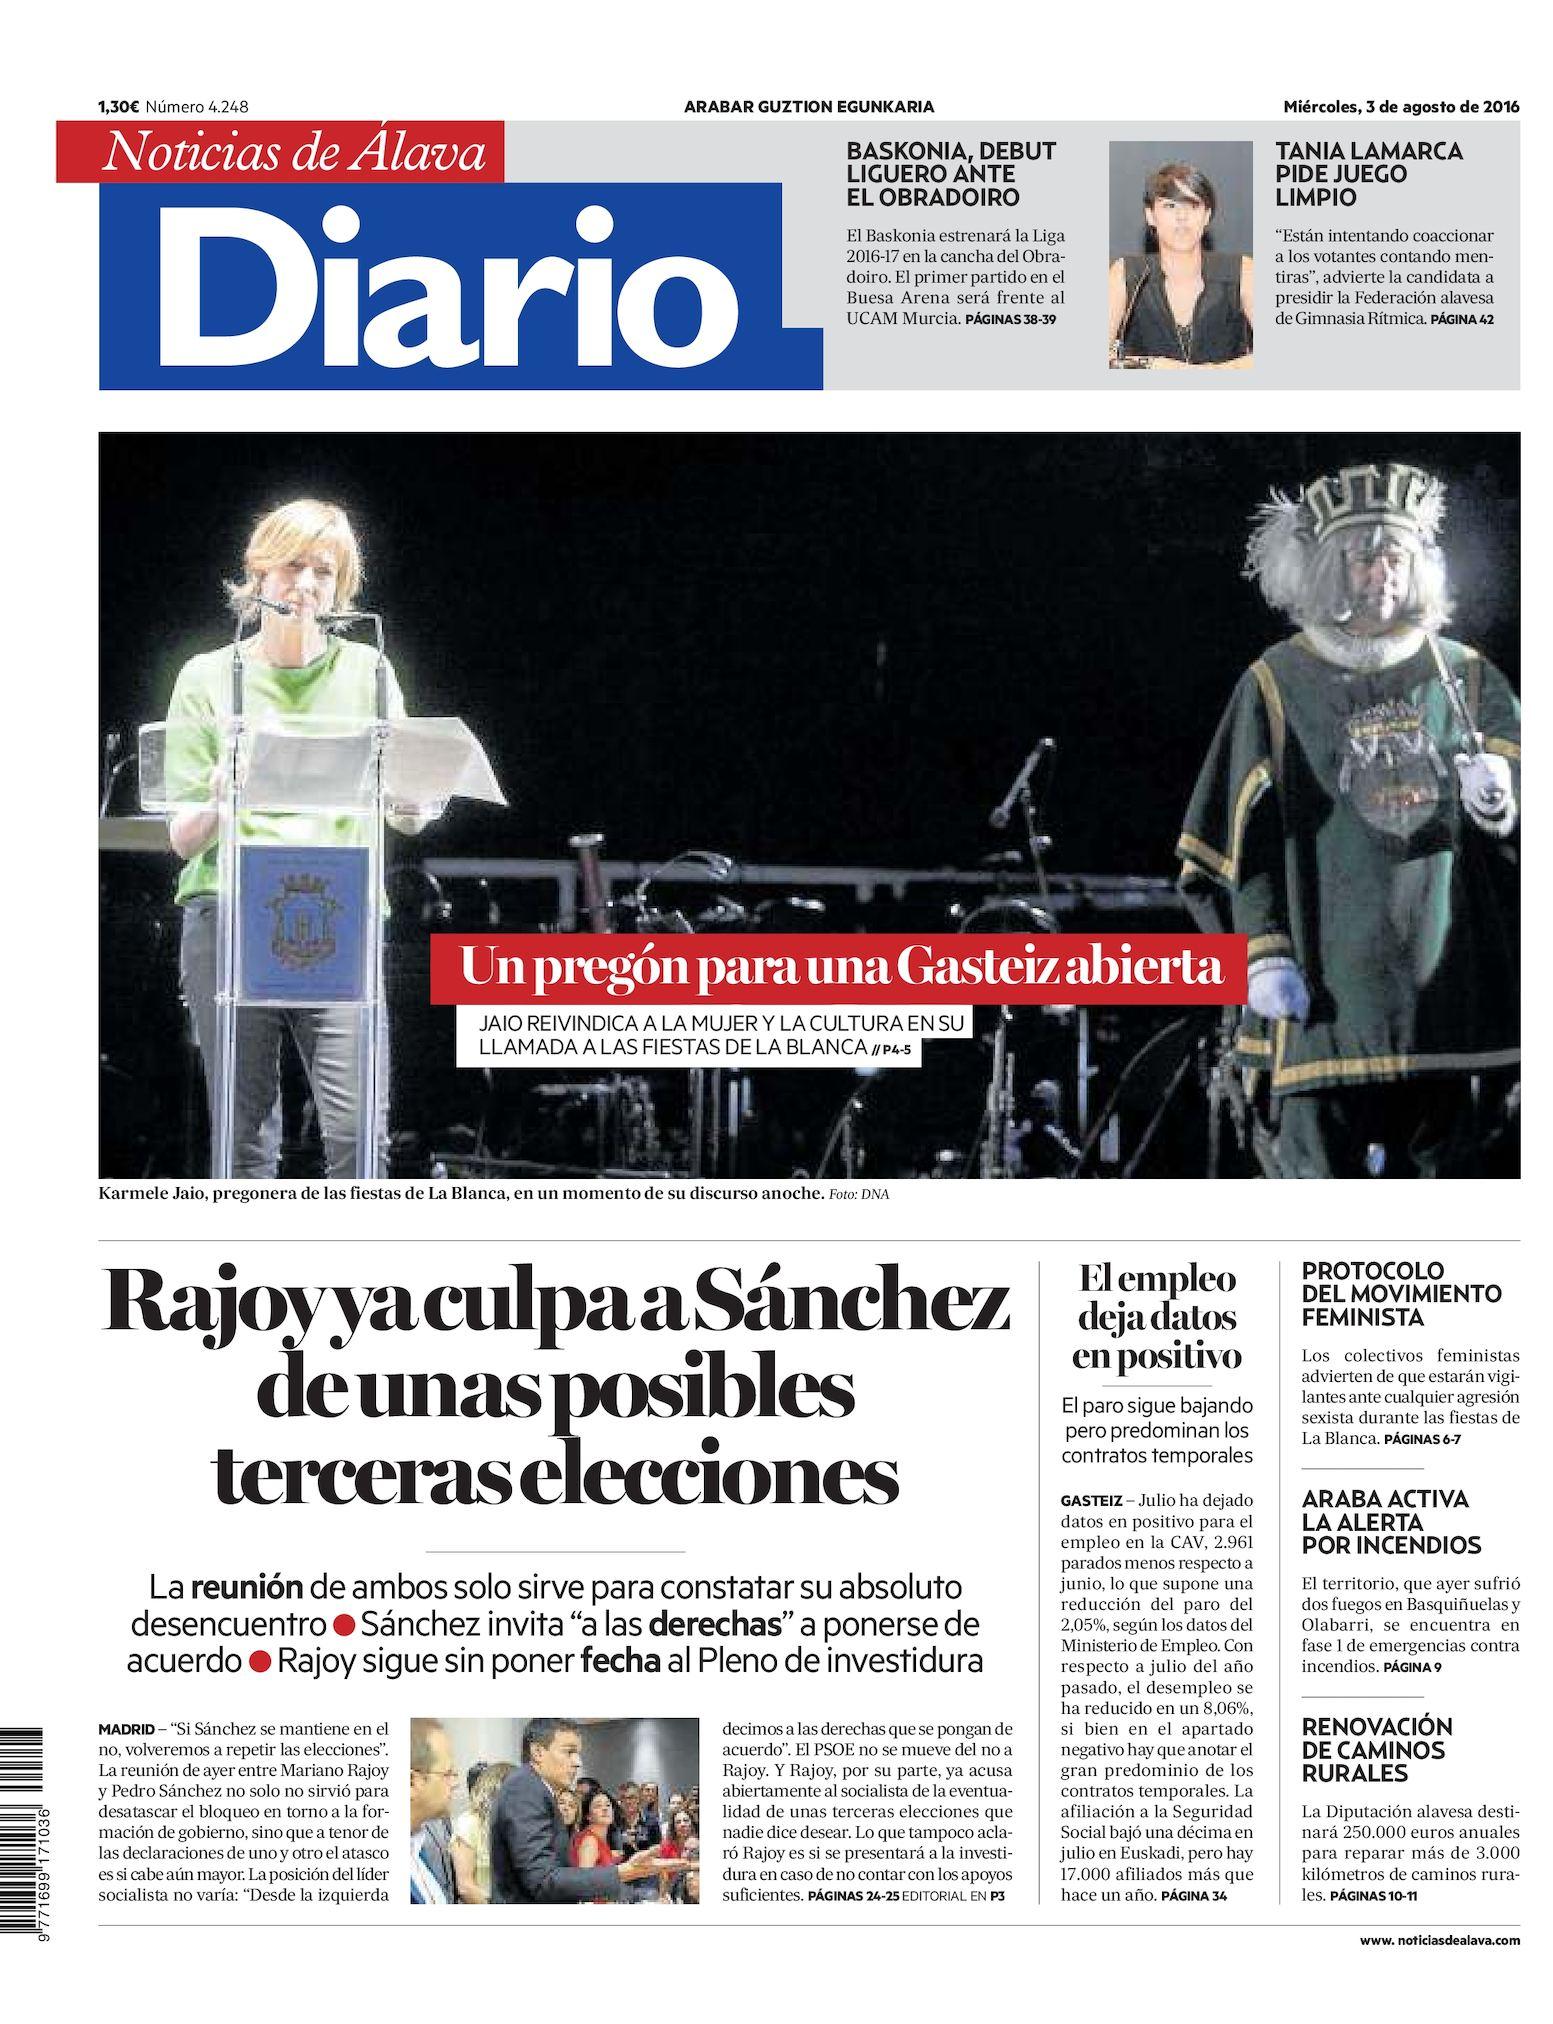 Calaméo - Diario de Noticias de Álava 20160803 d1c819c42c0